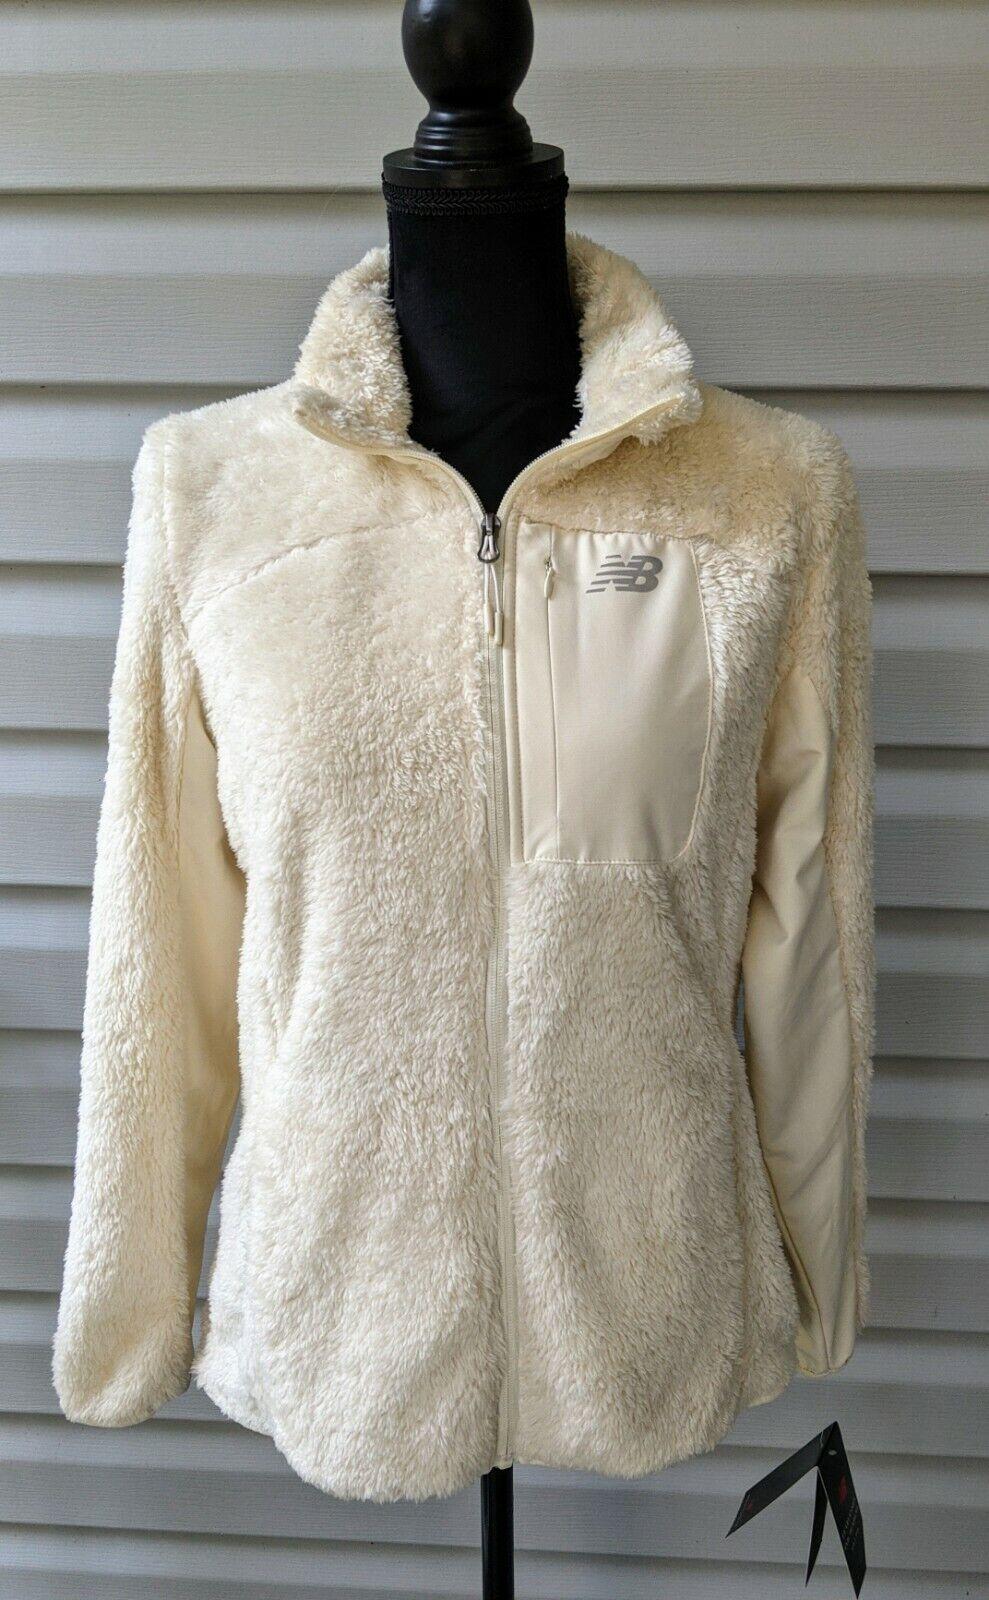 NEW BALANCE NB Full Zip Fleece Pile Faux Fur Jacket White Cream M Medium NWT